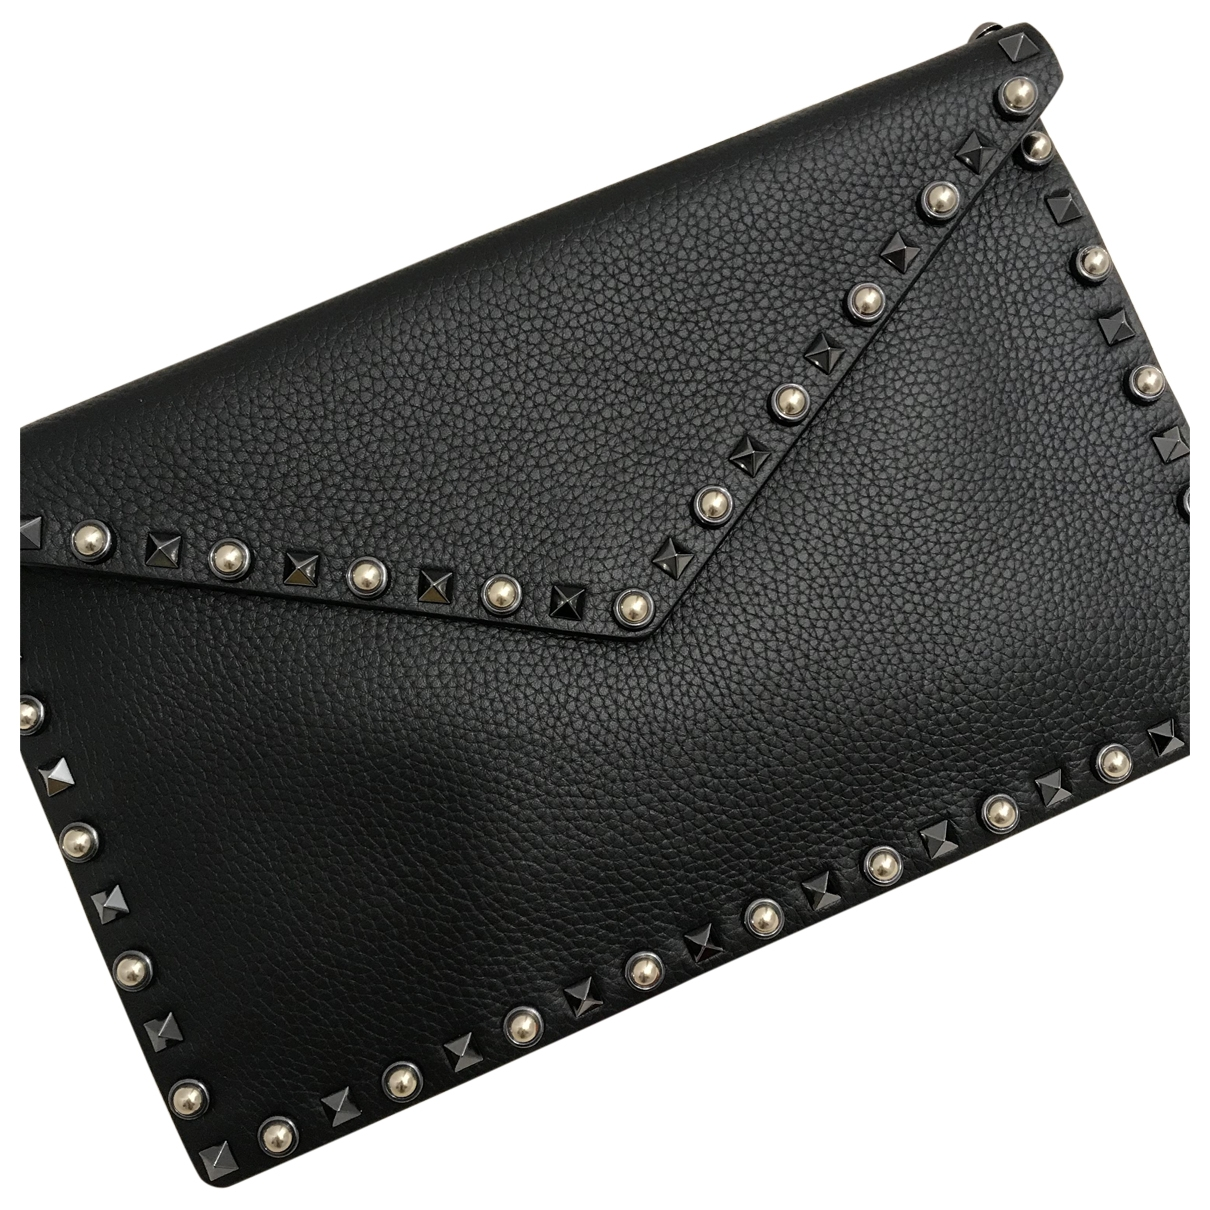 Valentino Garavani Rockstud Black Leather Clutch bag for Women \N